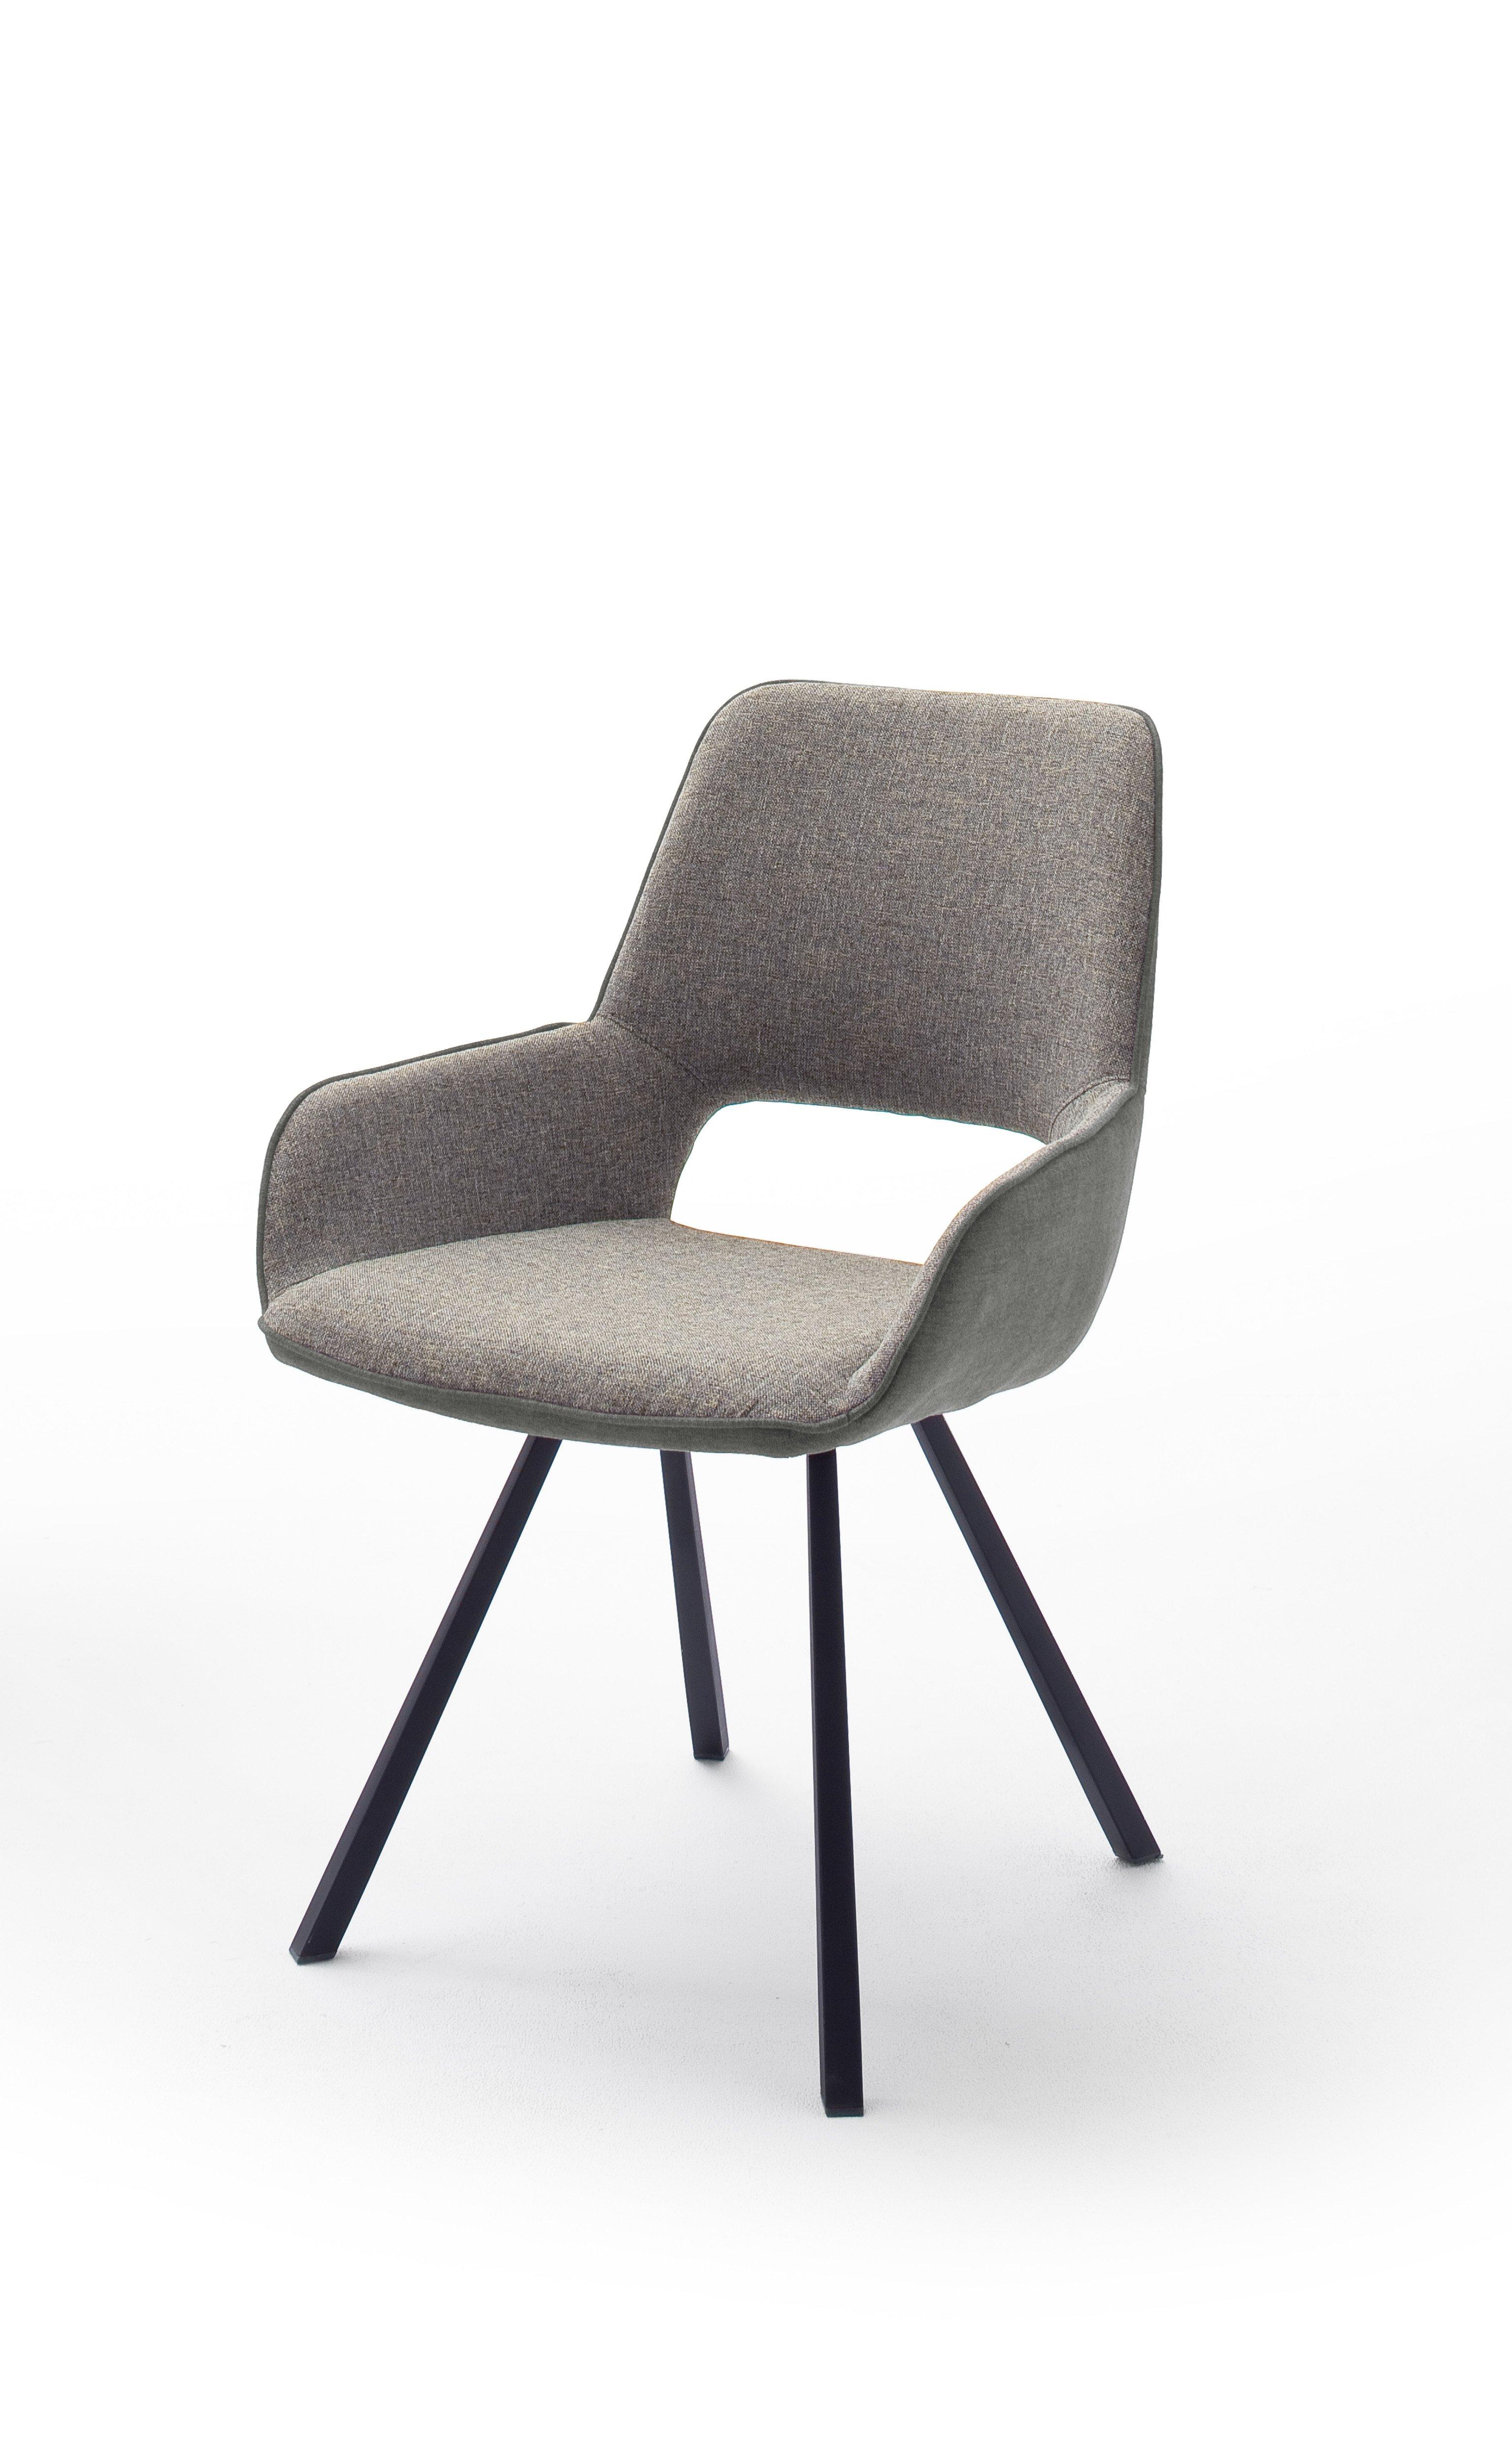 4 Fuß Stuhl,